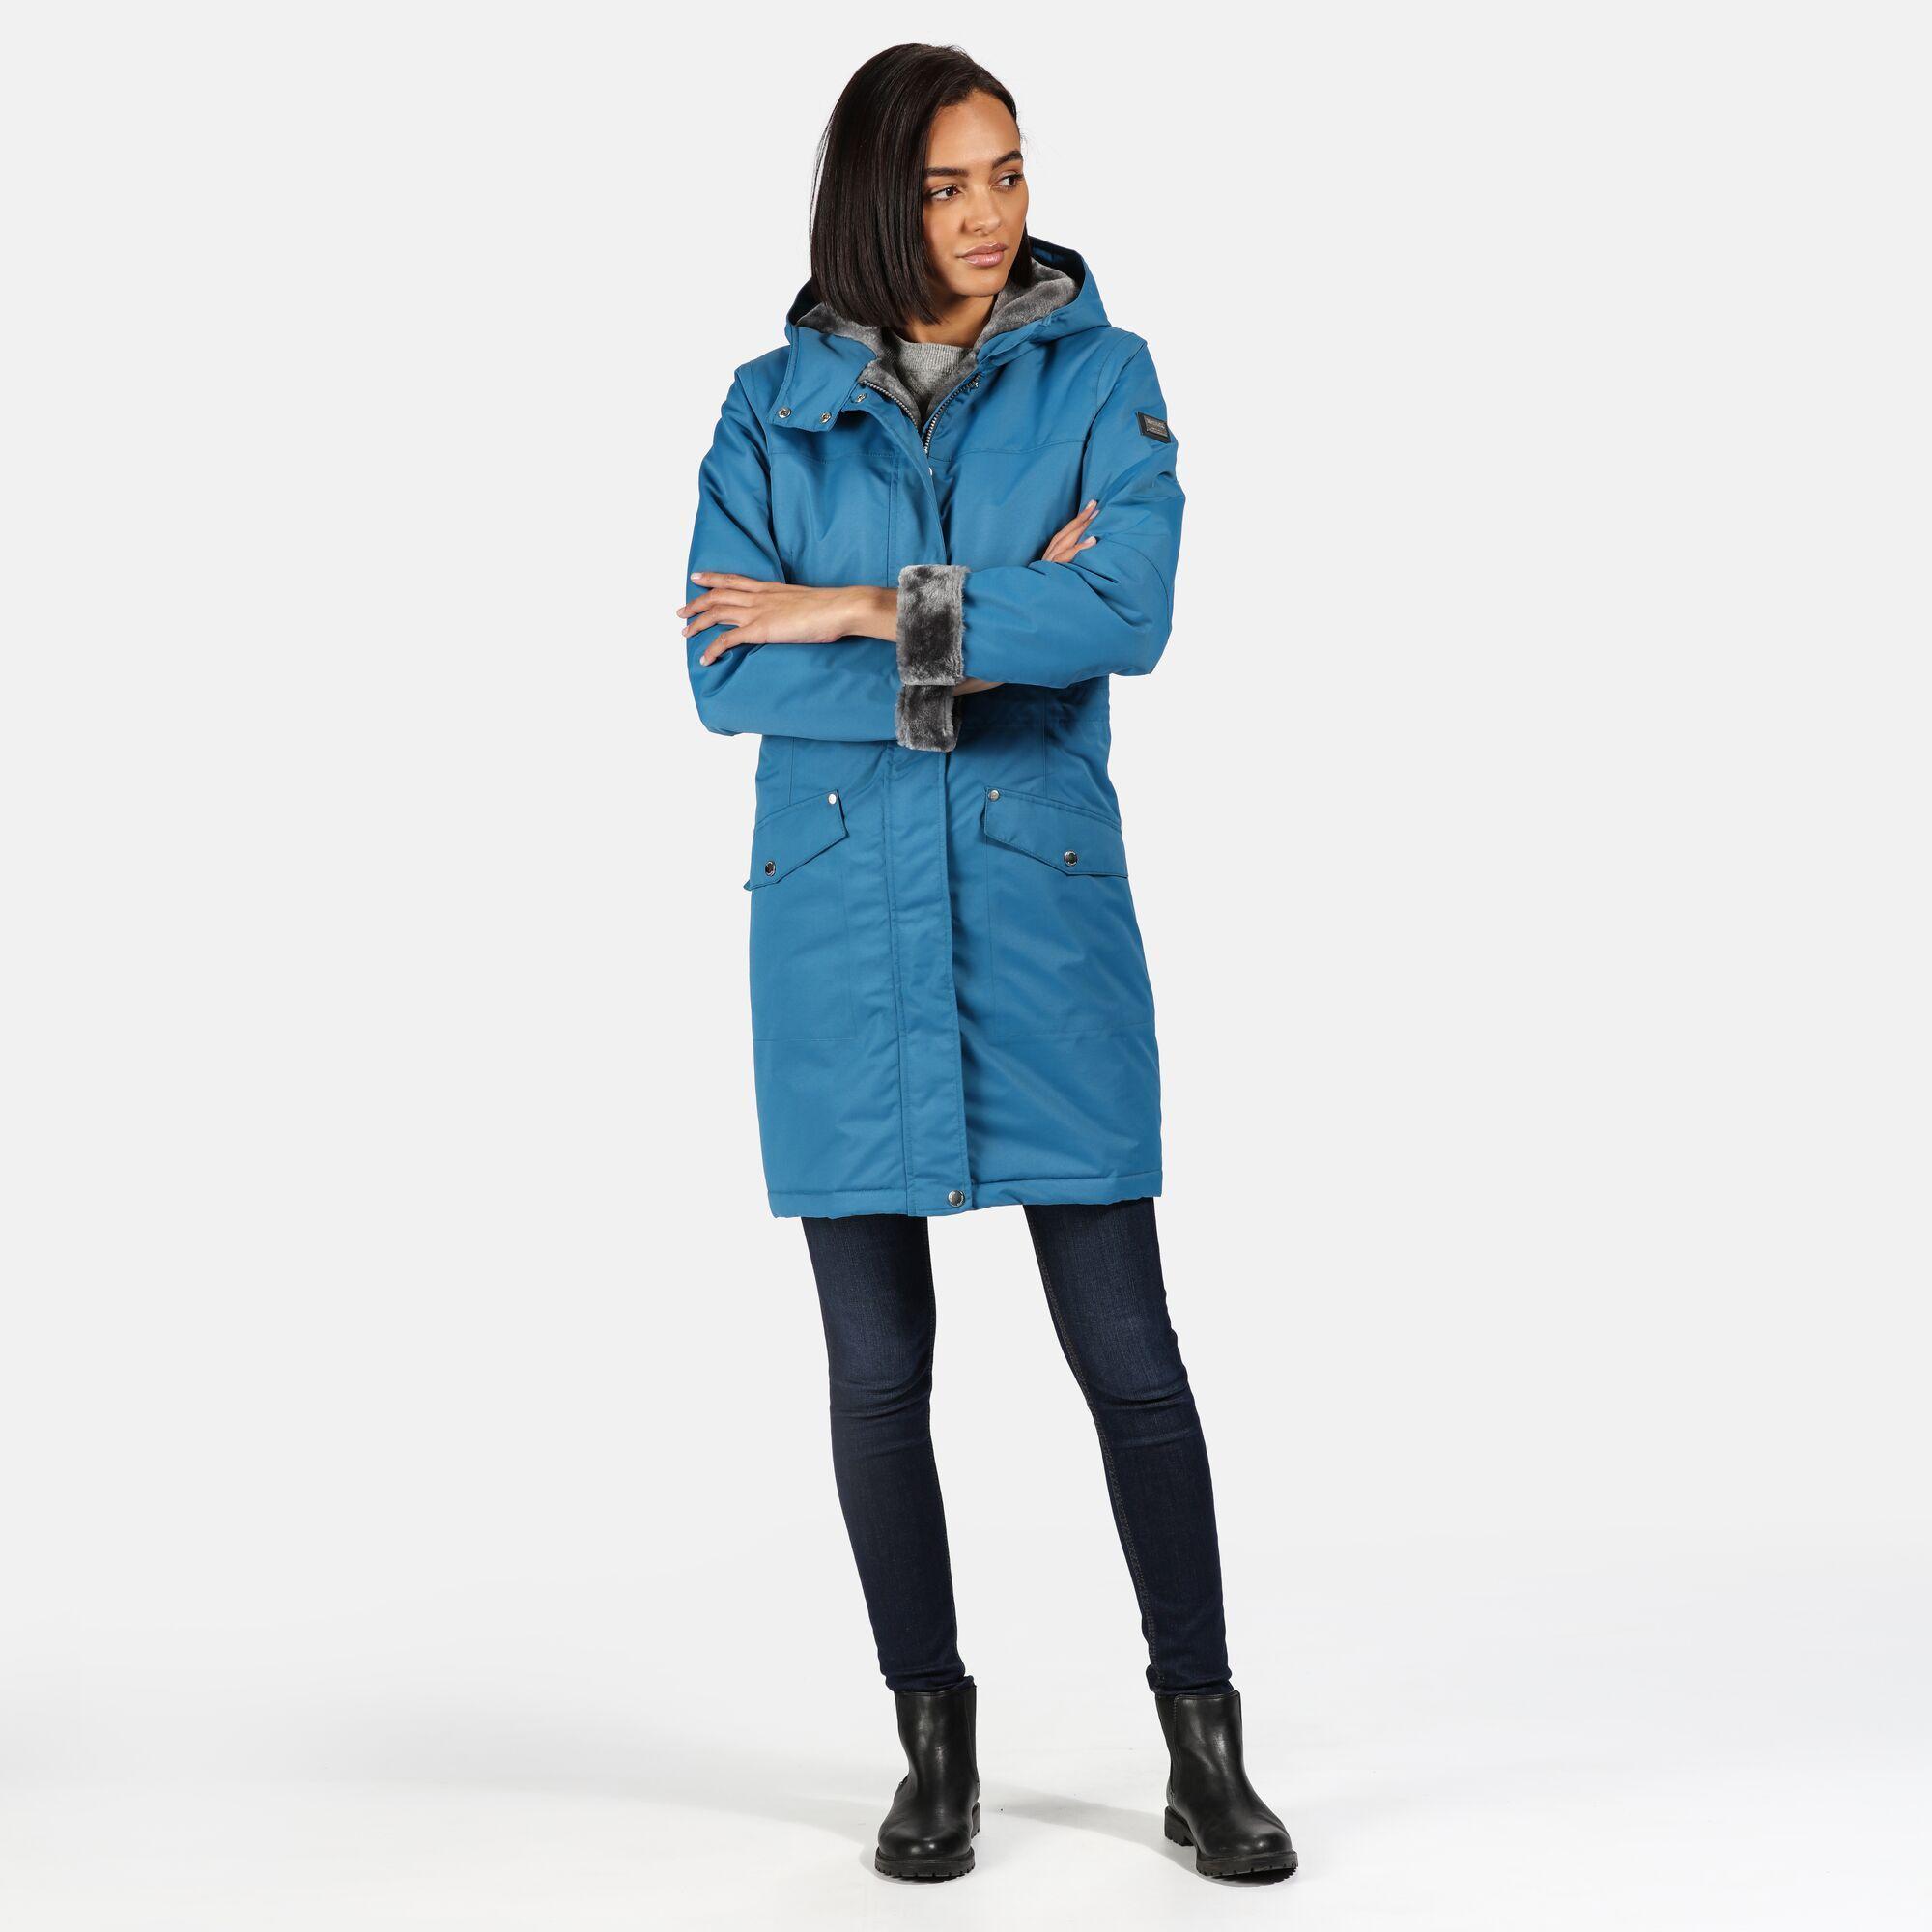 Regatta Womens/Ladies Rimona Hooded Waterproof Jacket (Sapphire Blue)